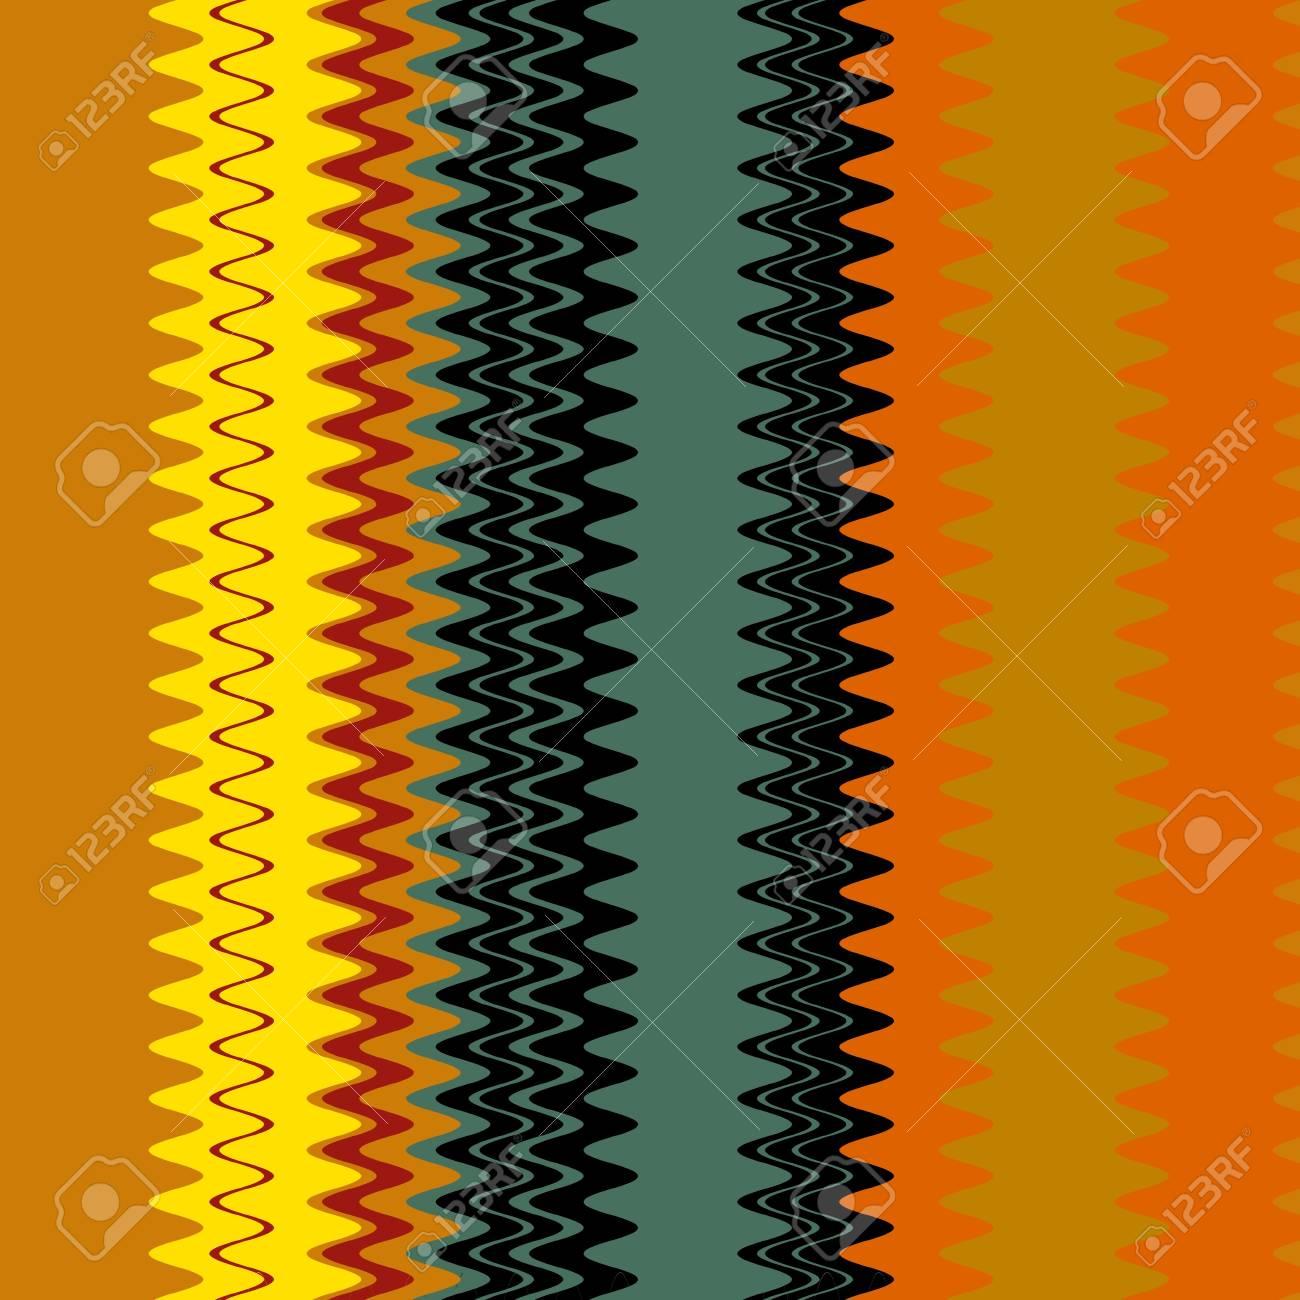 Chevron Colorful Fashion Zigzag Stripes Art Design Stock Photo - 14112043